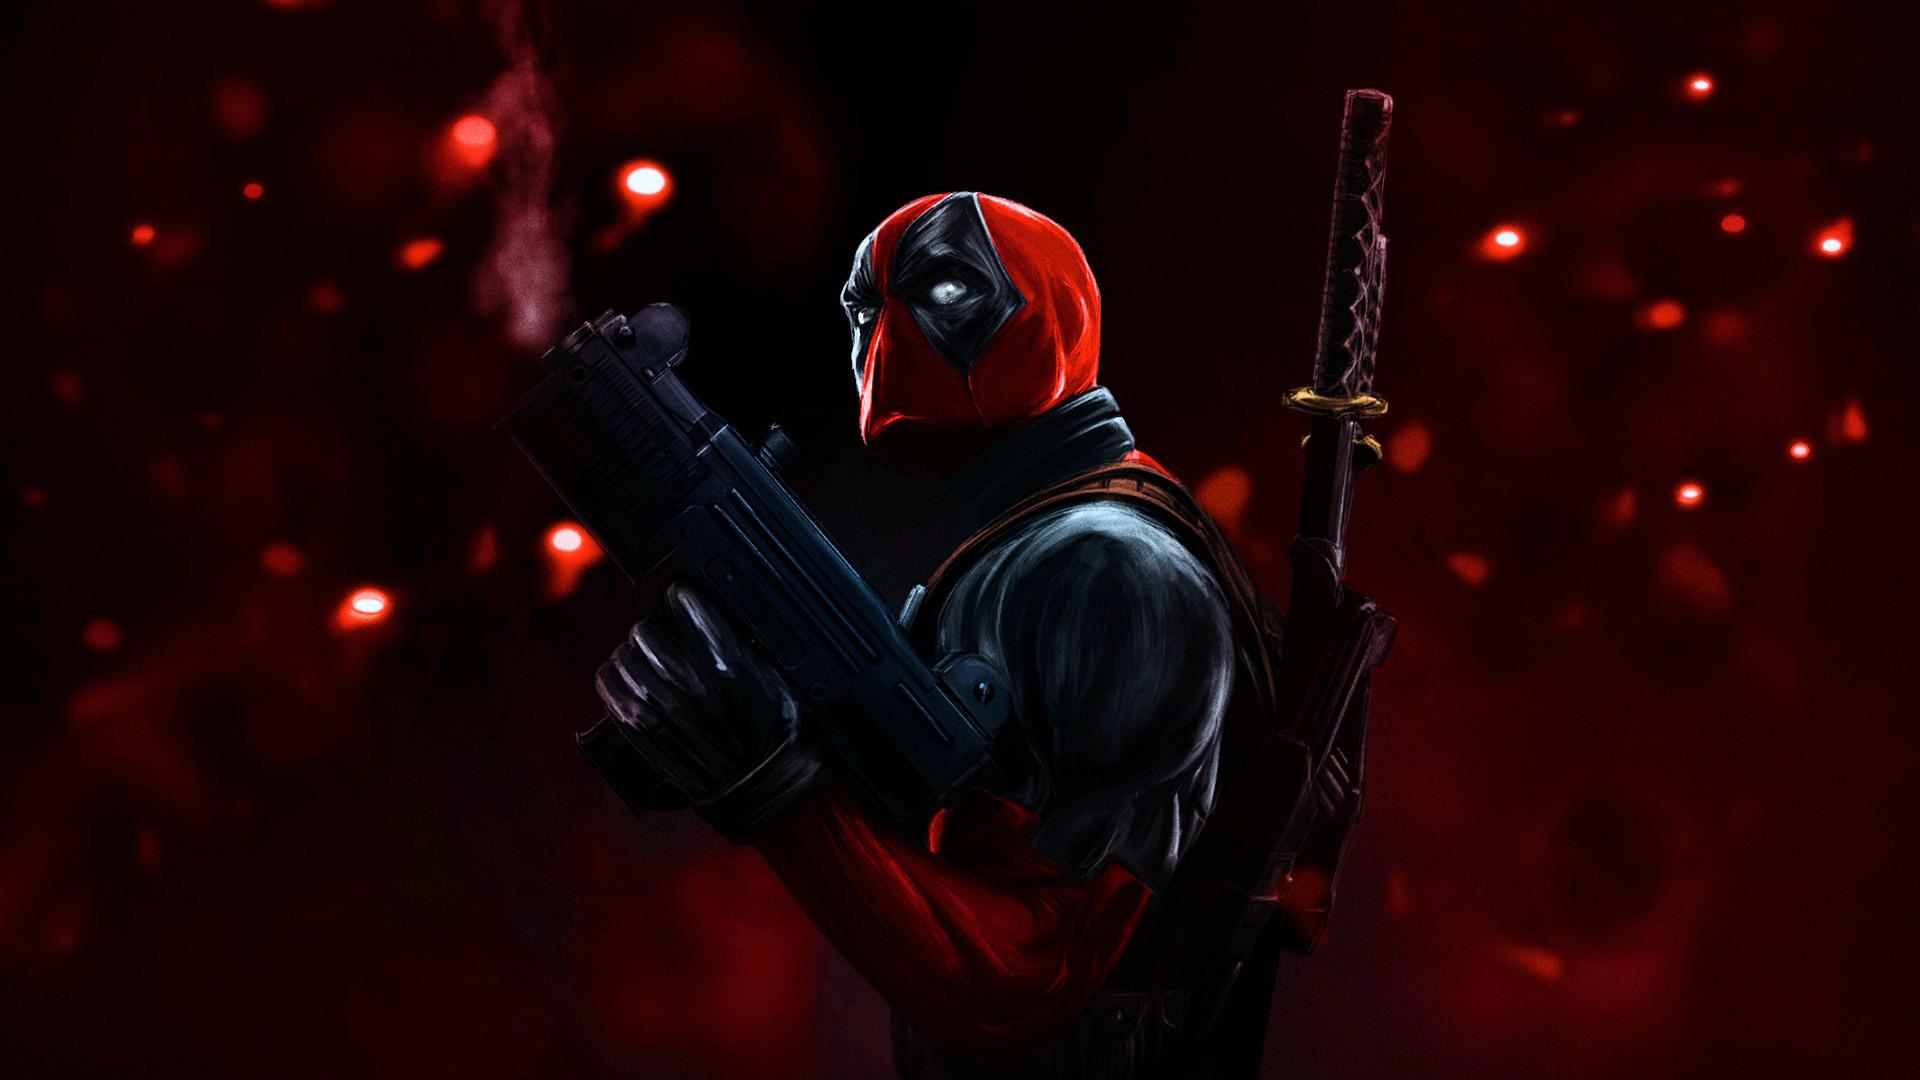 Deadpool Hd Wallpaper Background Image 1920x1080 Id 499345